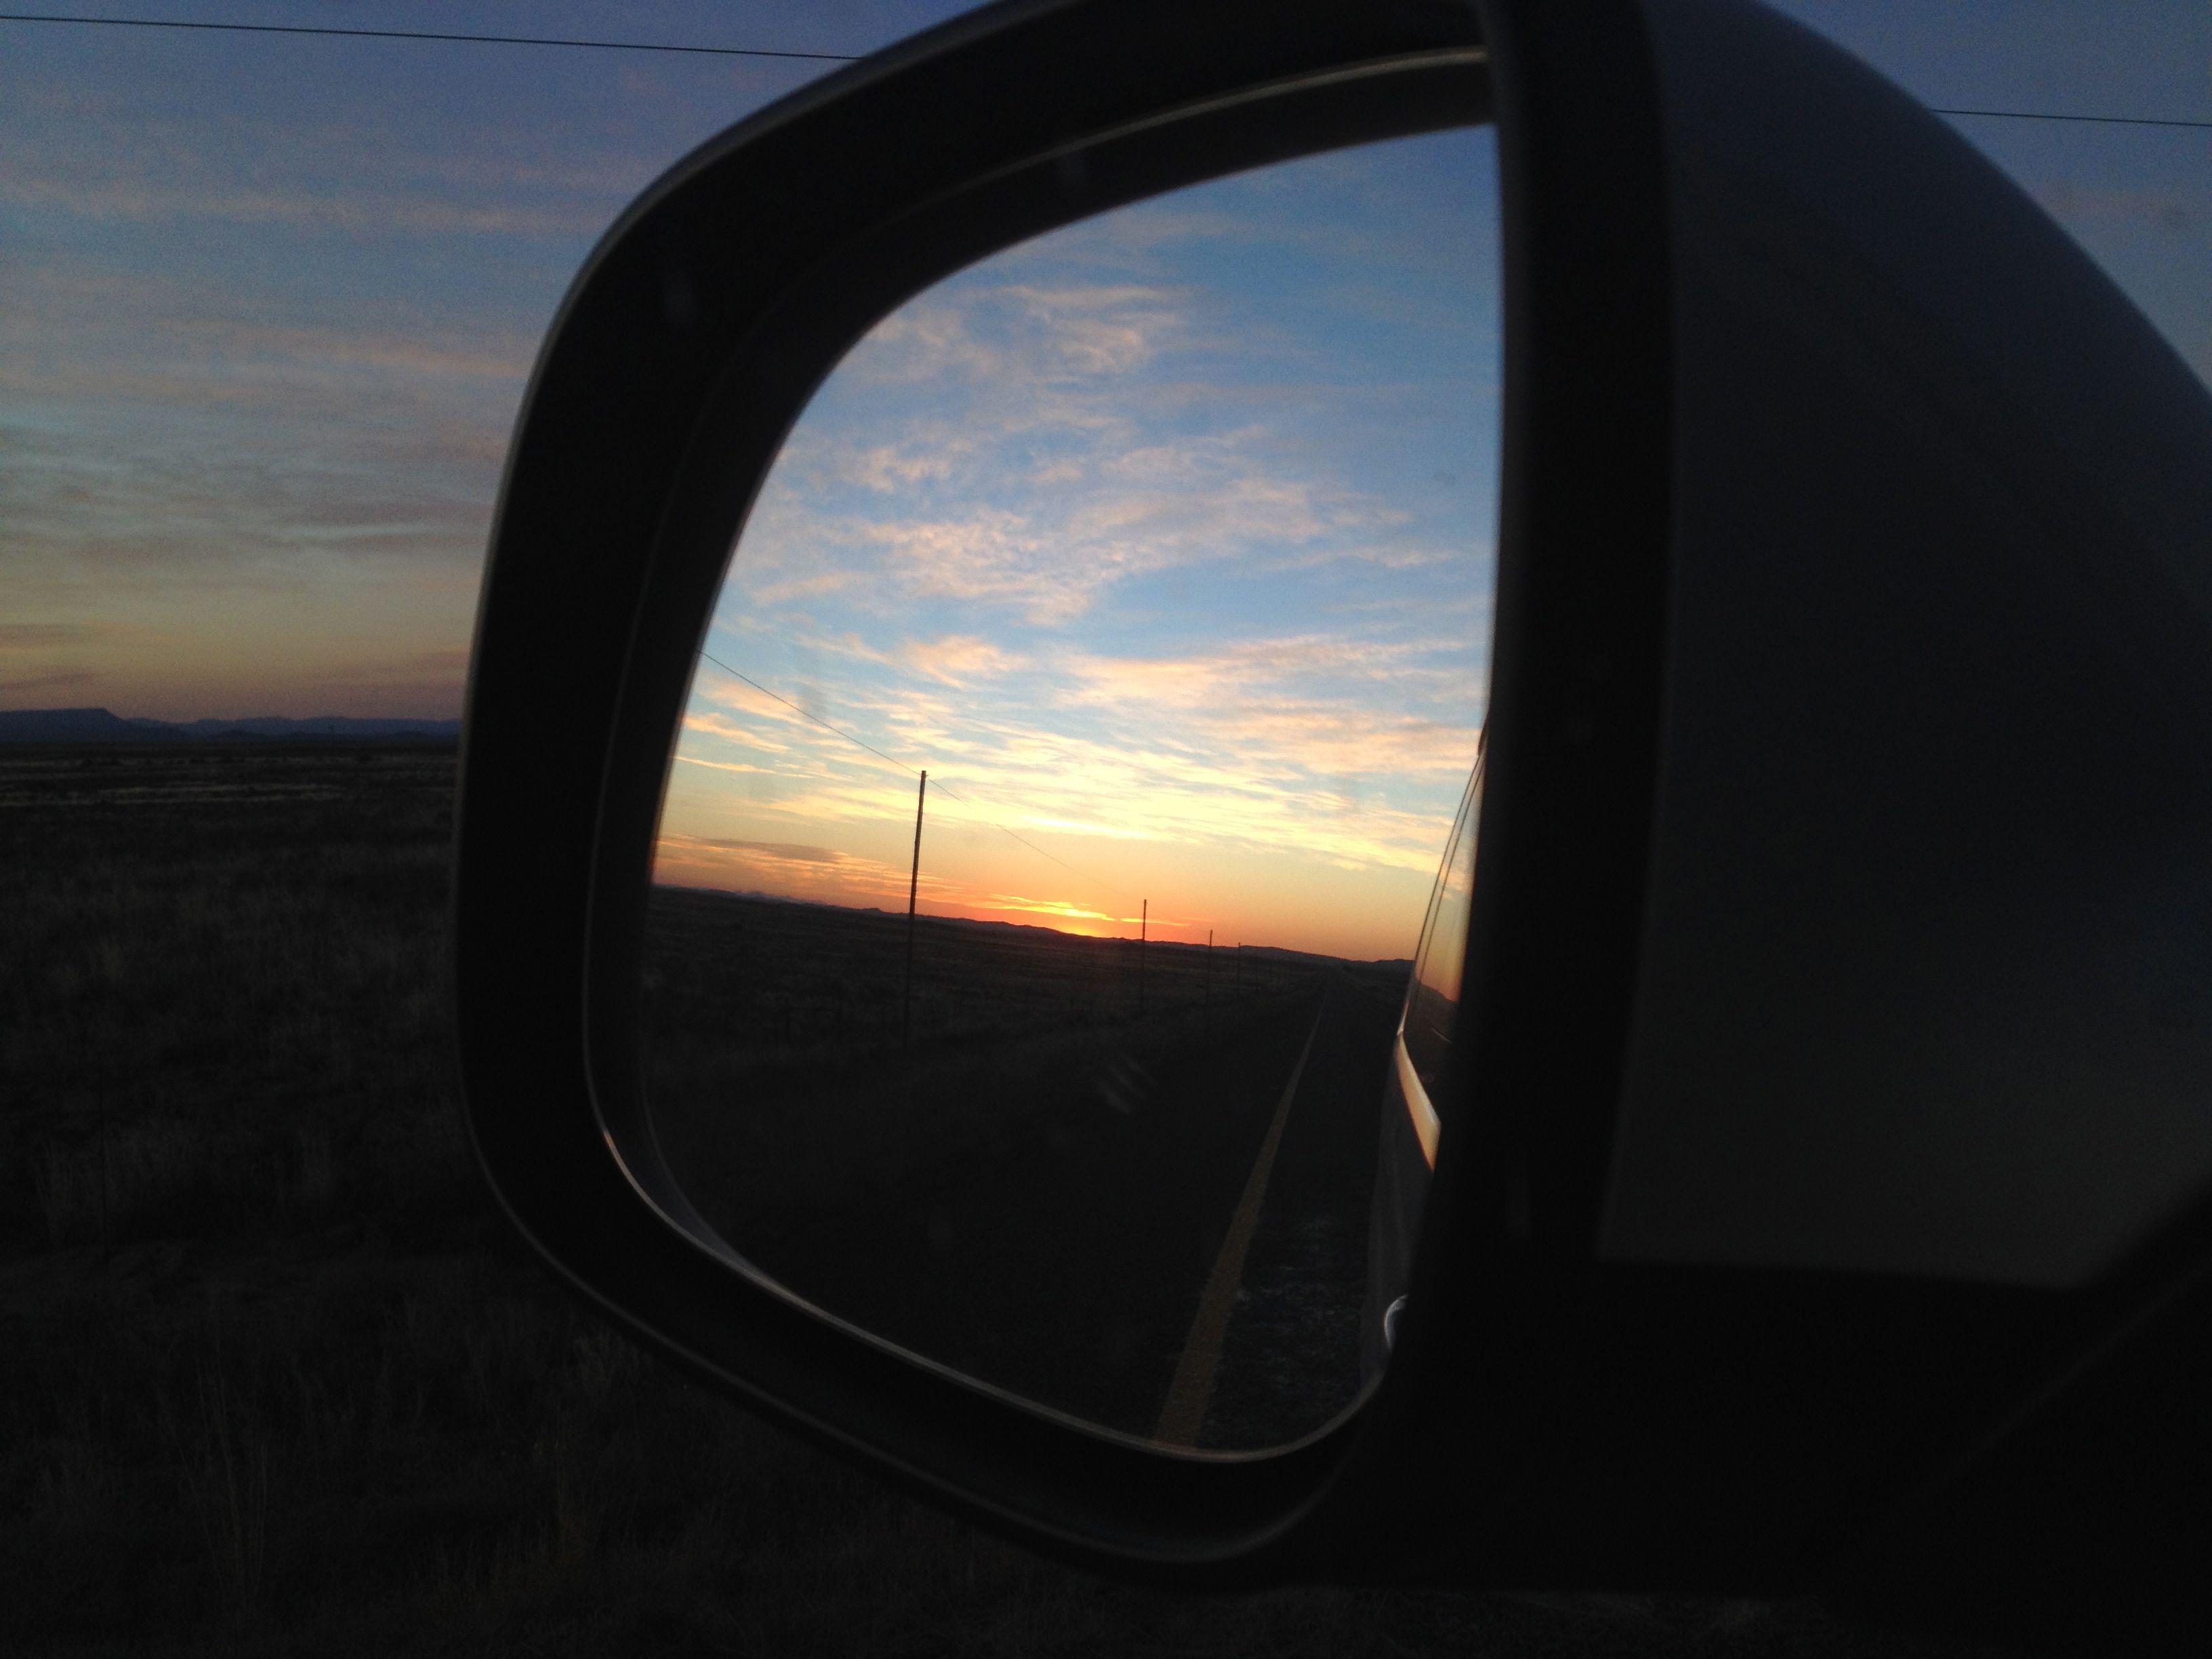 Sunrise on the empty roads through the Karoo